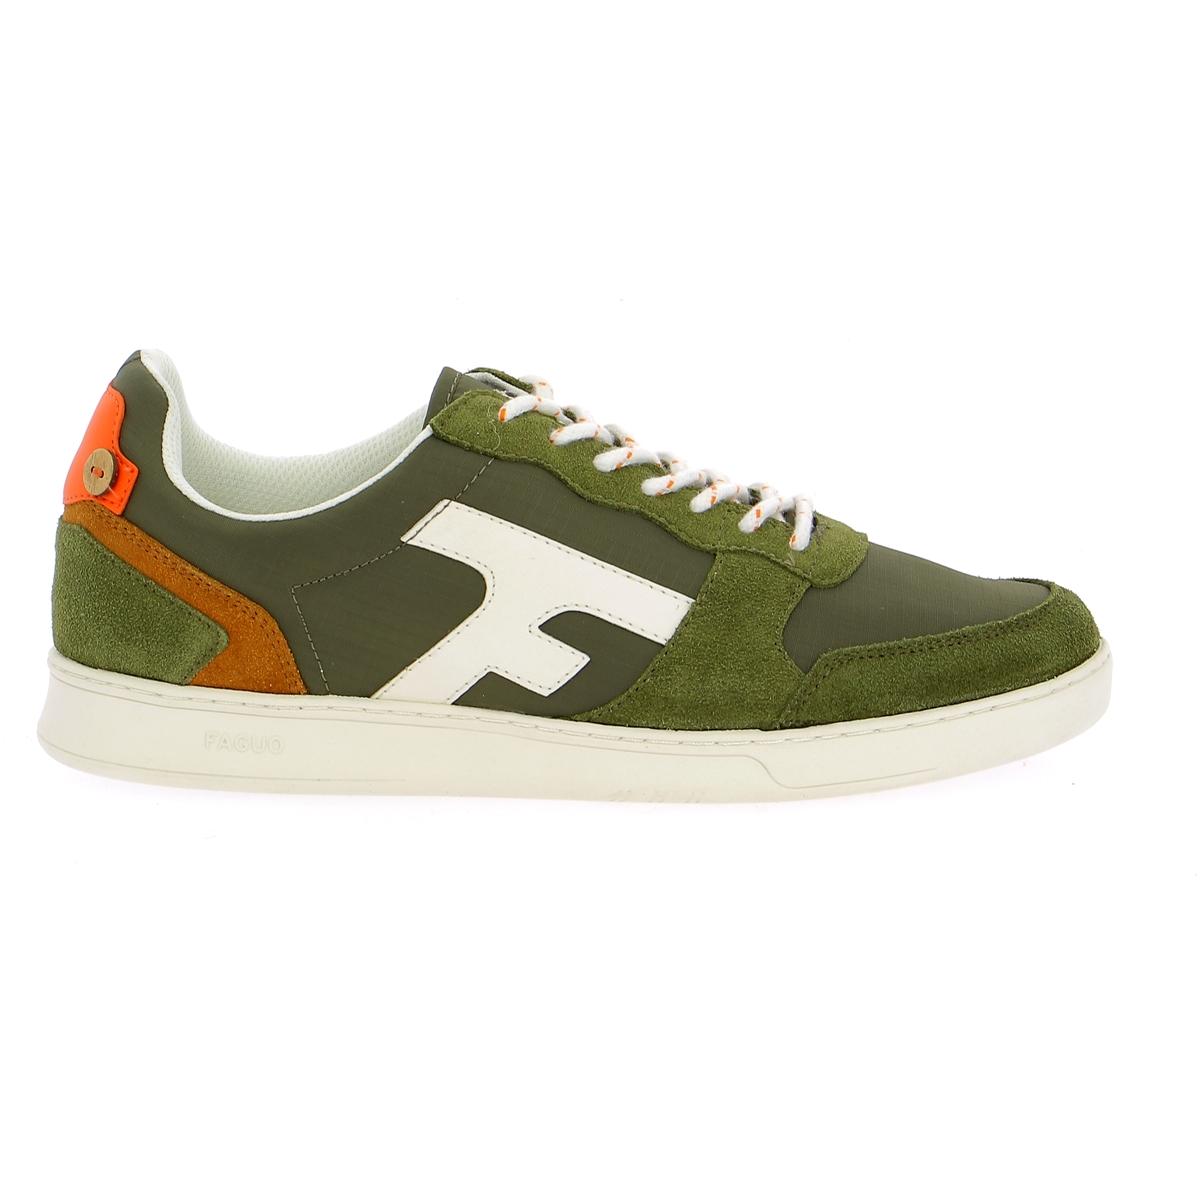 Faguo Sneakers kaki